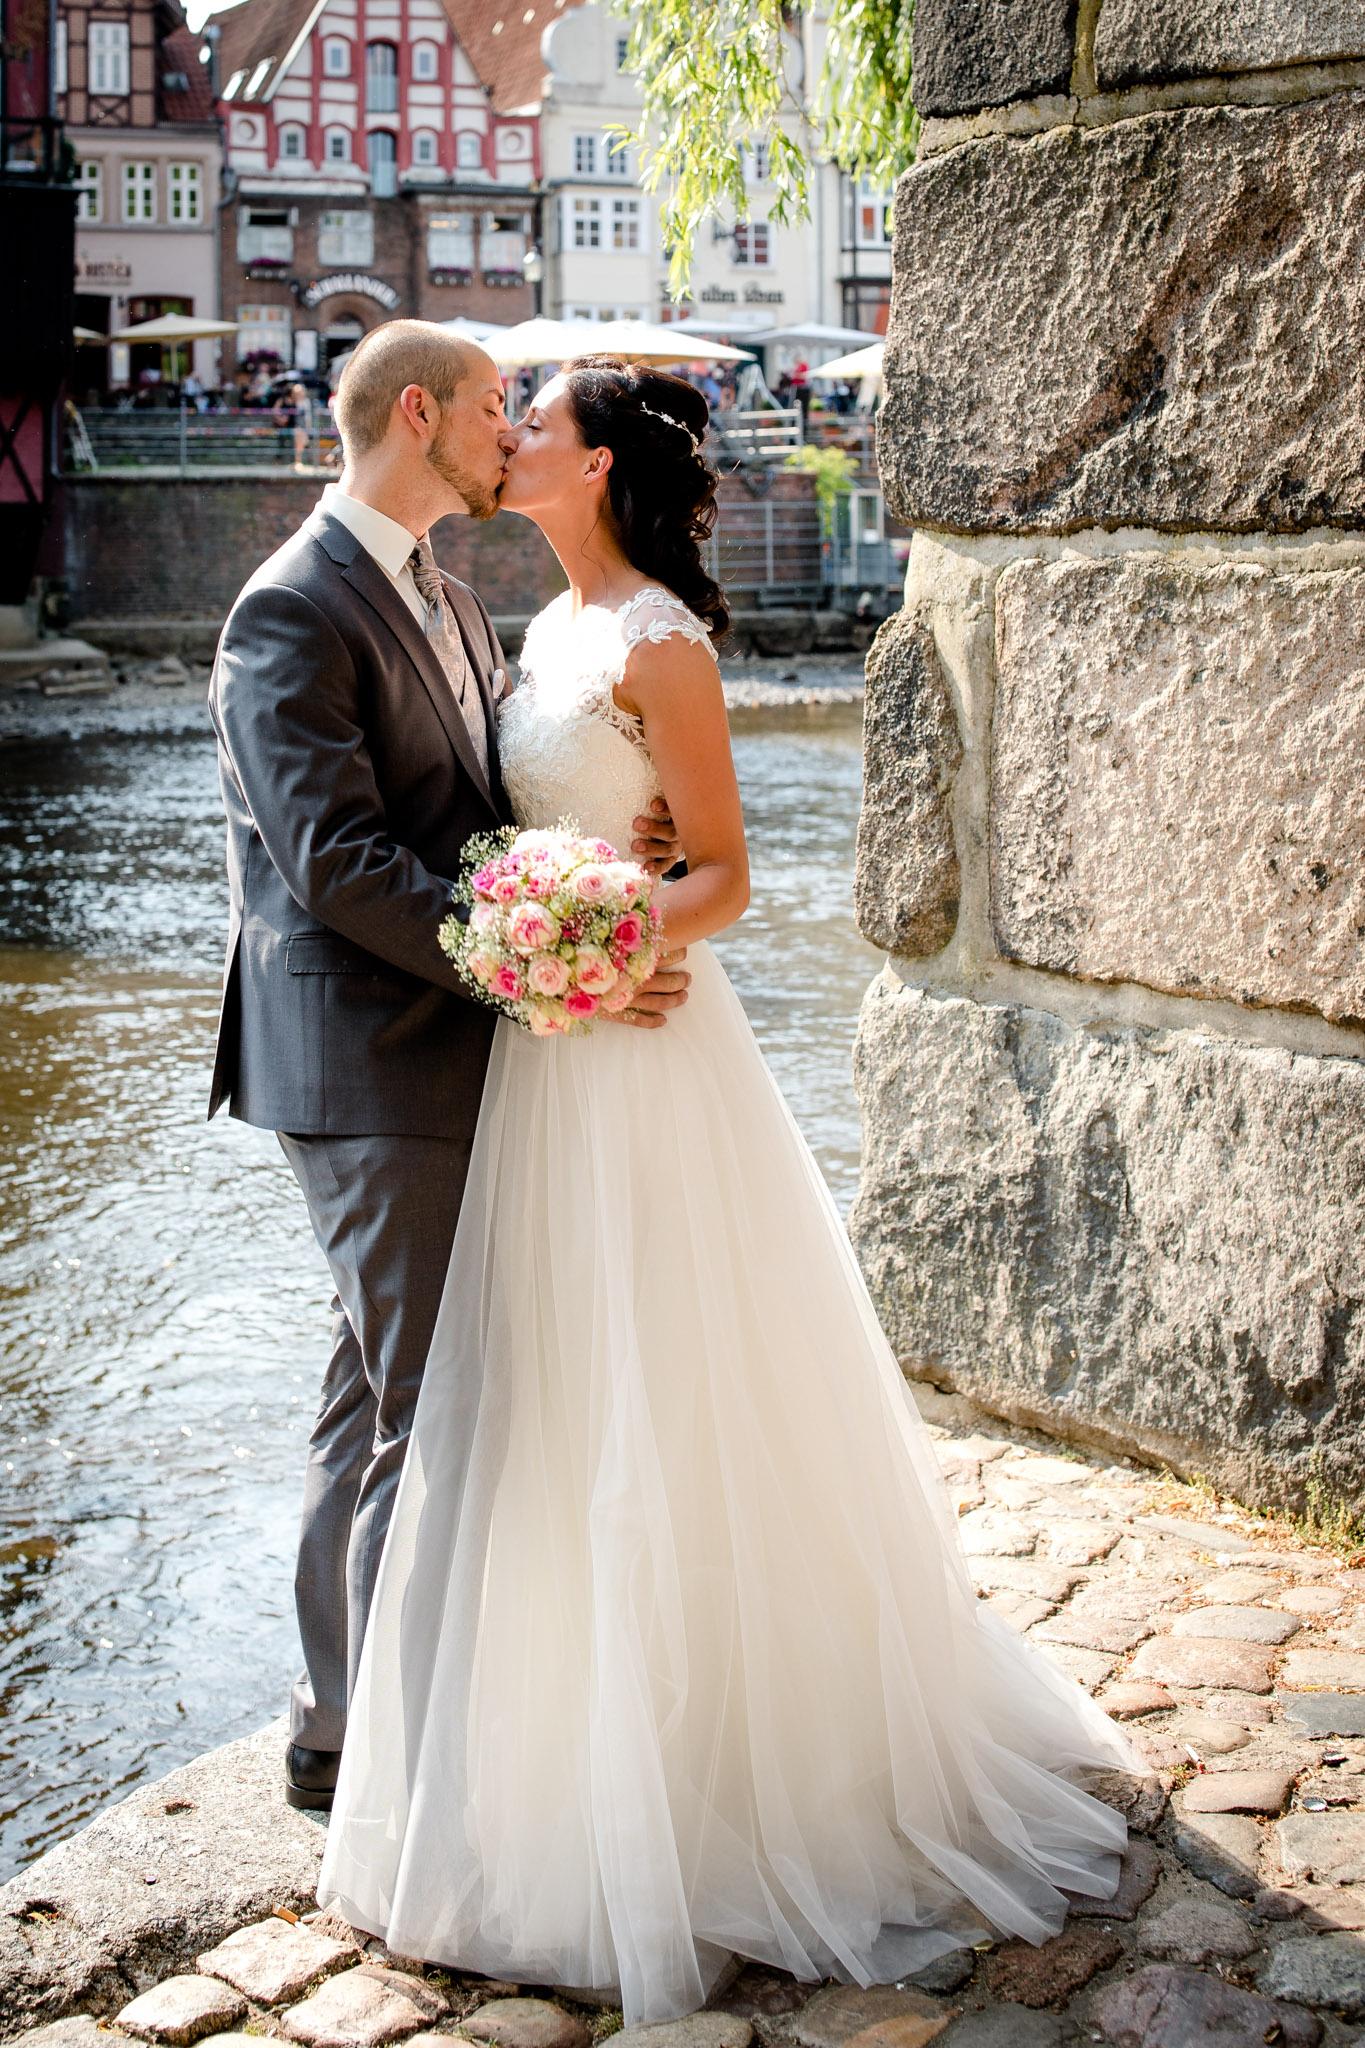 Brautpaar in Lüneburg an der Ilmenau